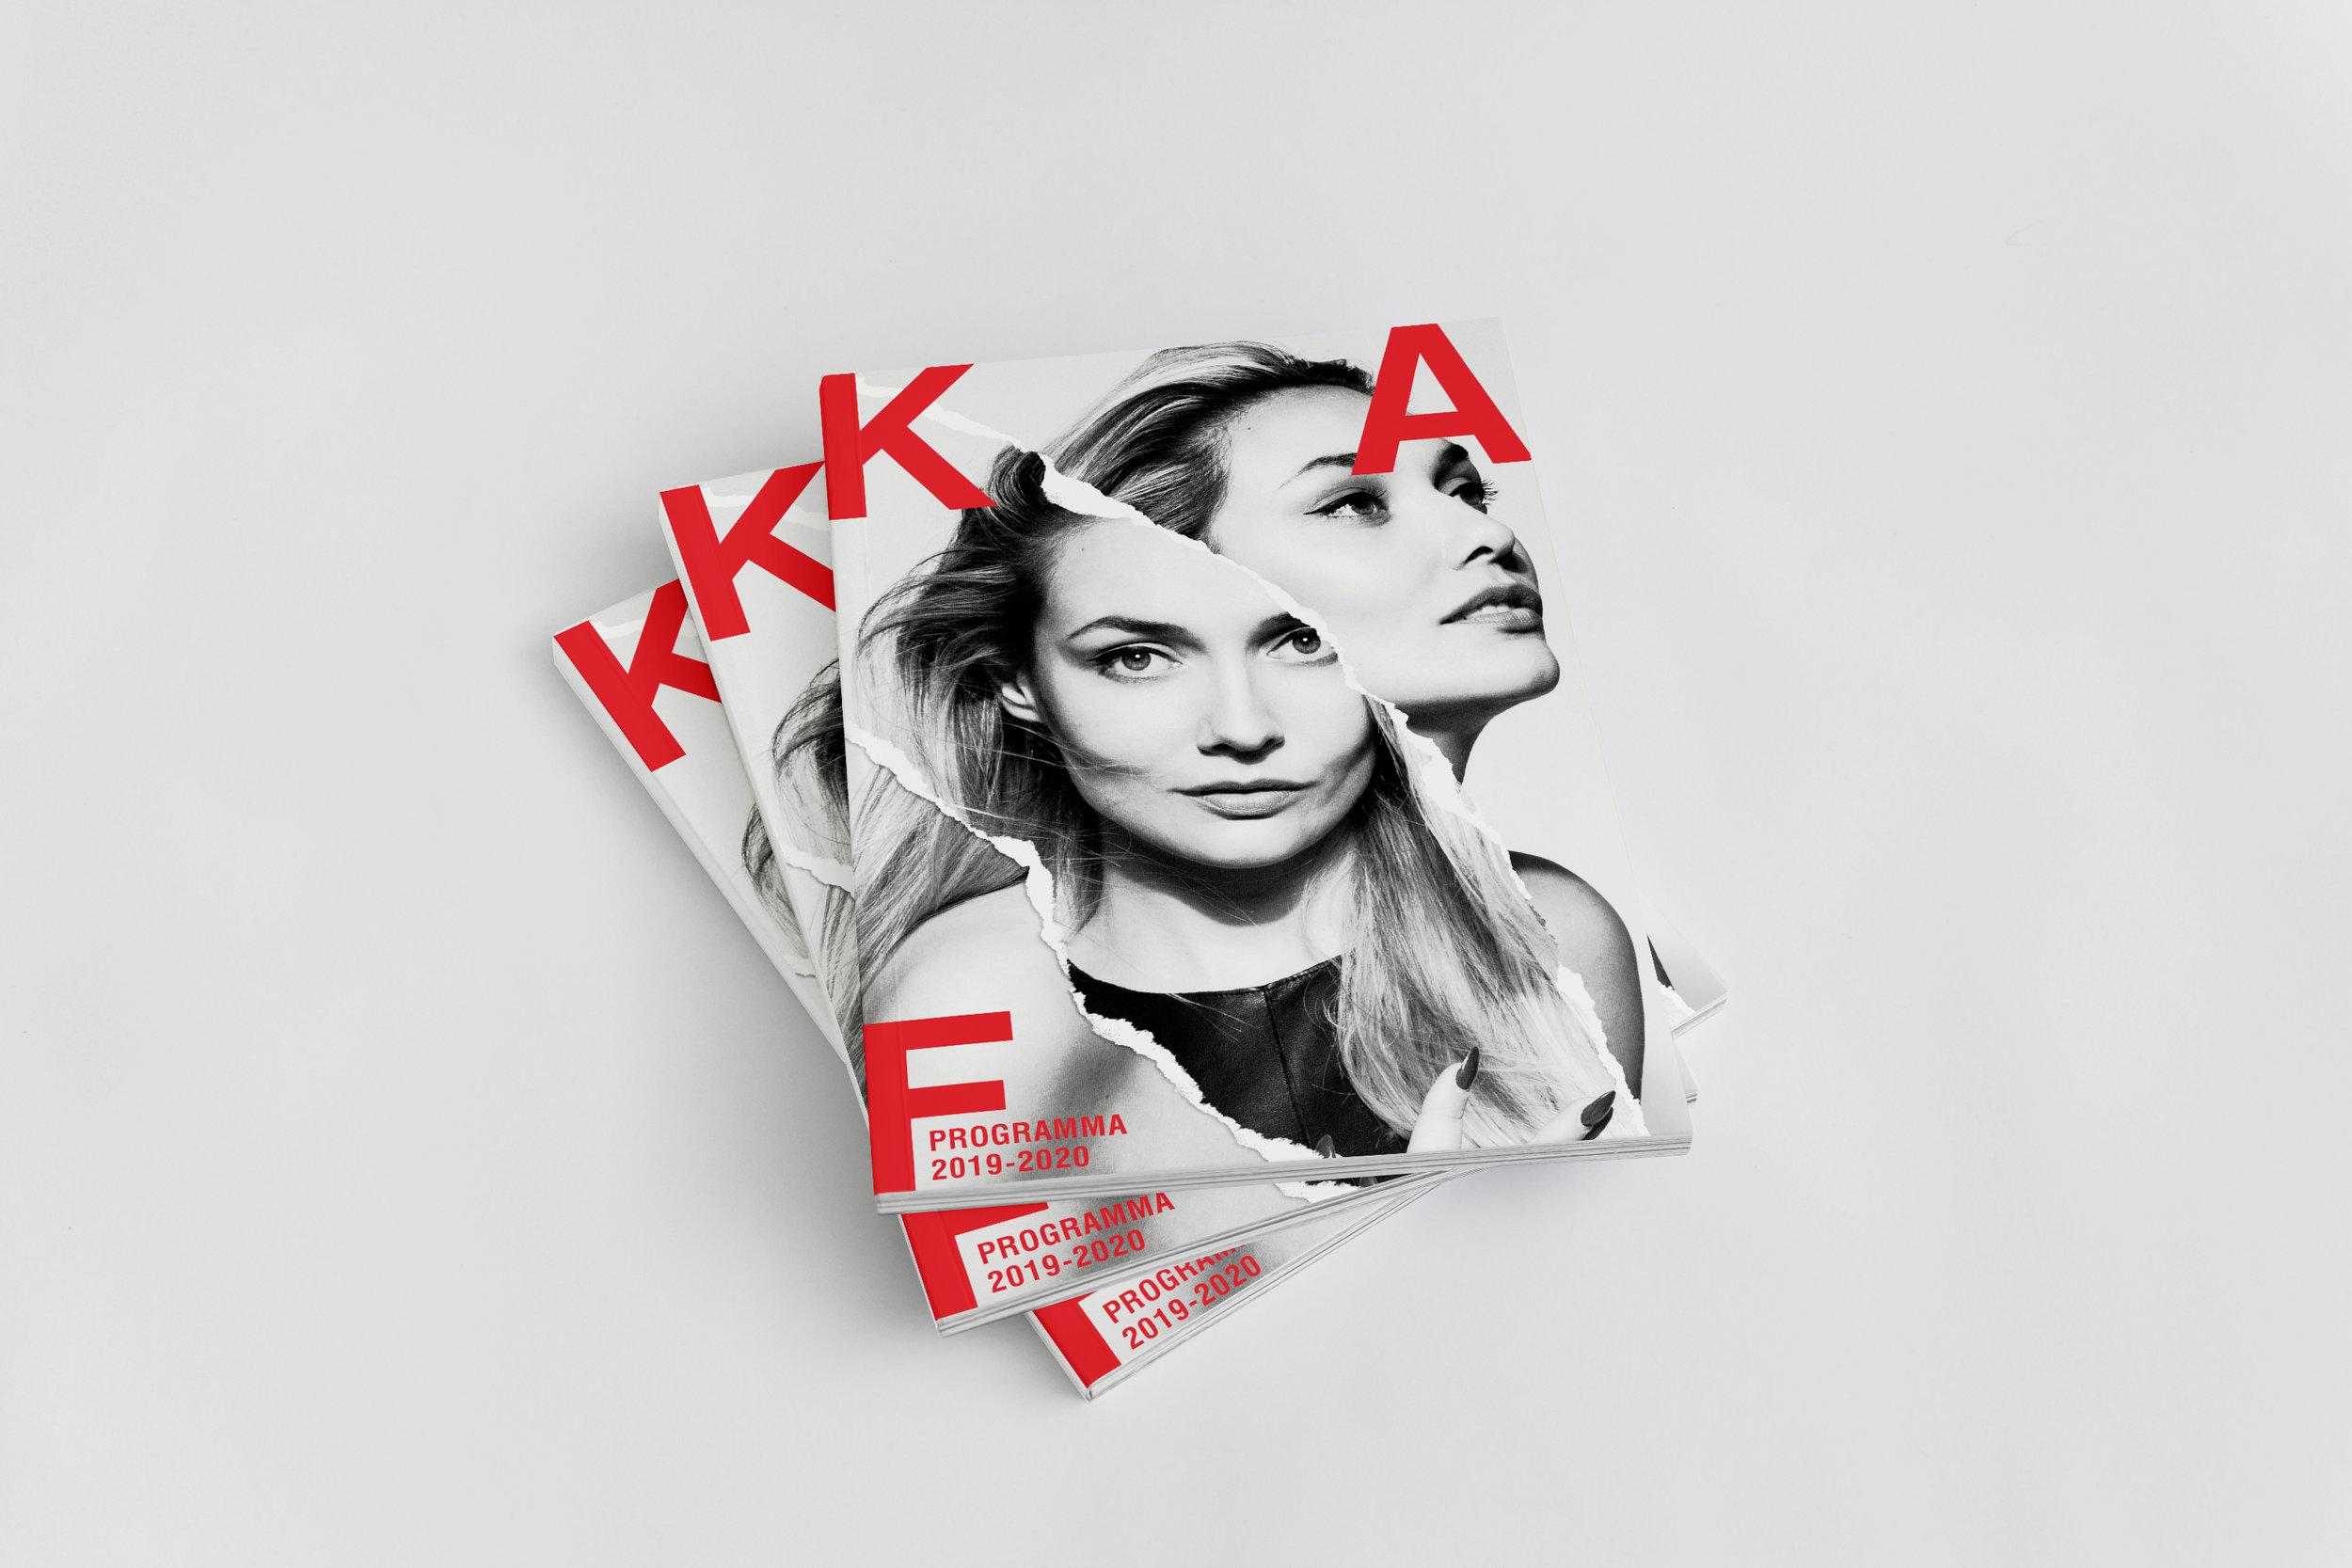 KAF IDENTITY & PROGRAMMA 2019-2020 - Identity | Branding | Editorial Design